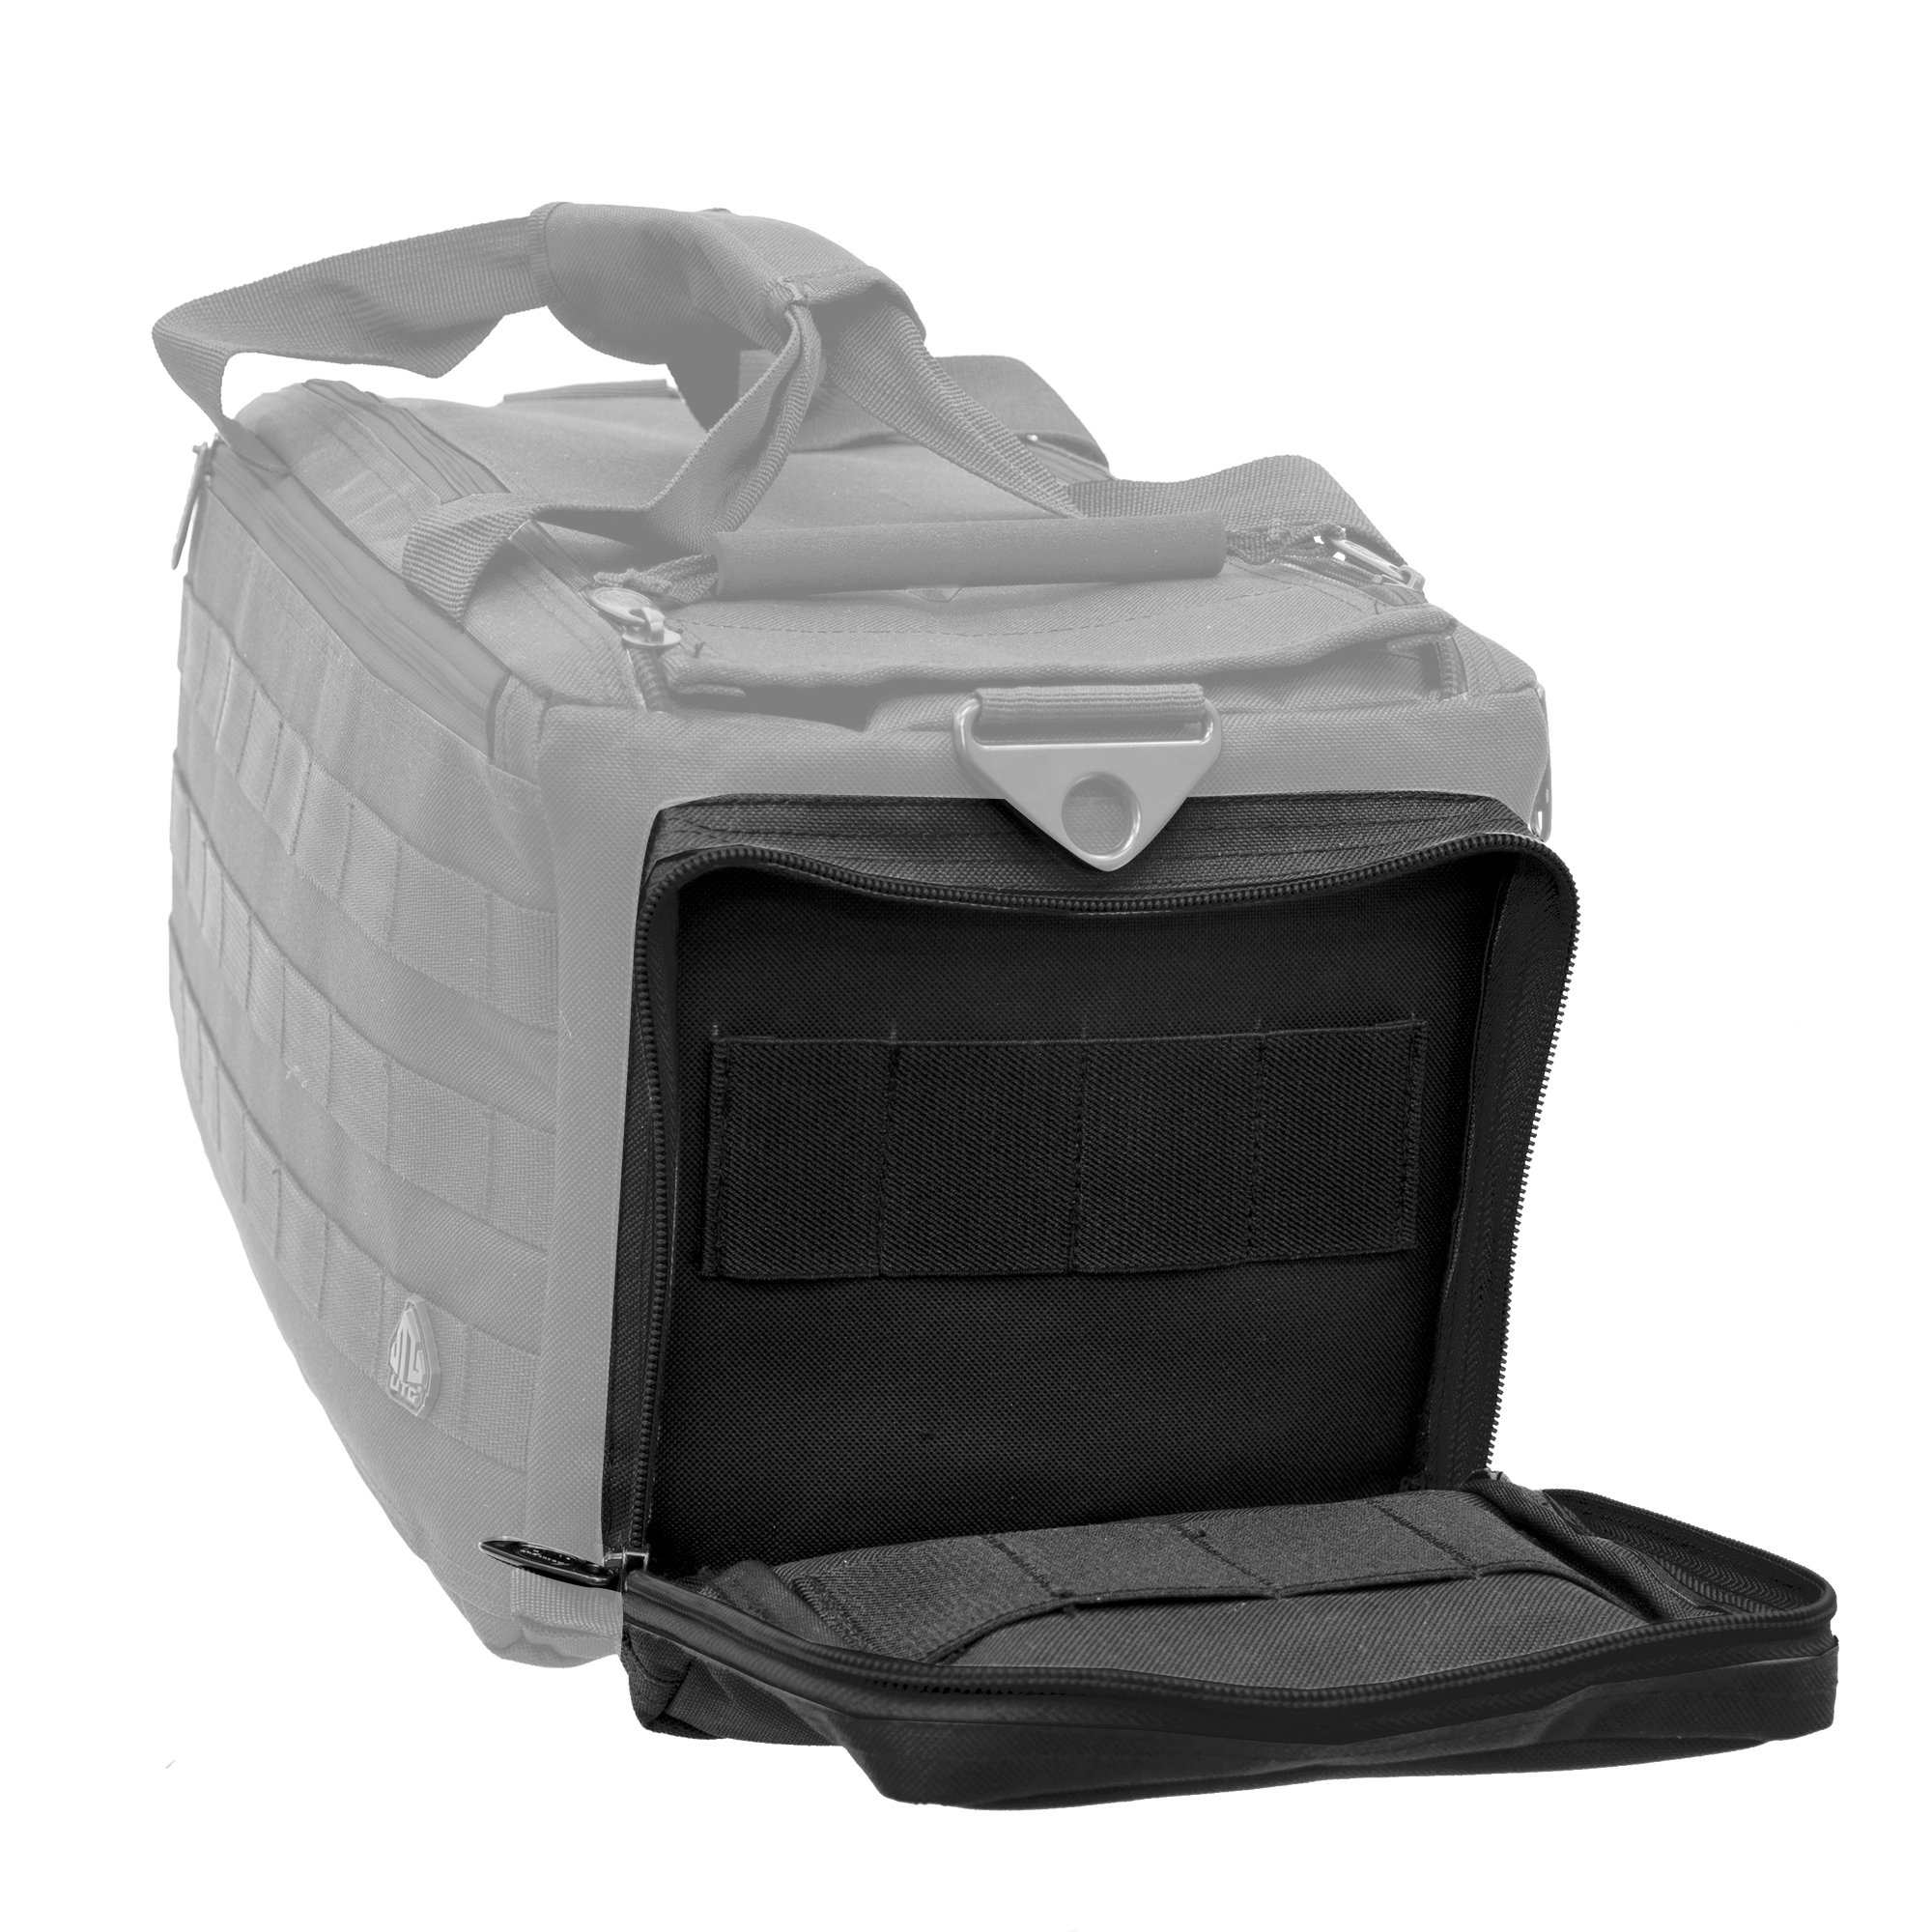 UTG All in One Range/Utility Go Bag, Black, 21'' x 10'' x 9'' by UTG (Image #9)